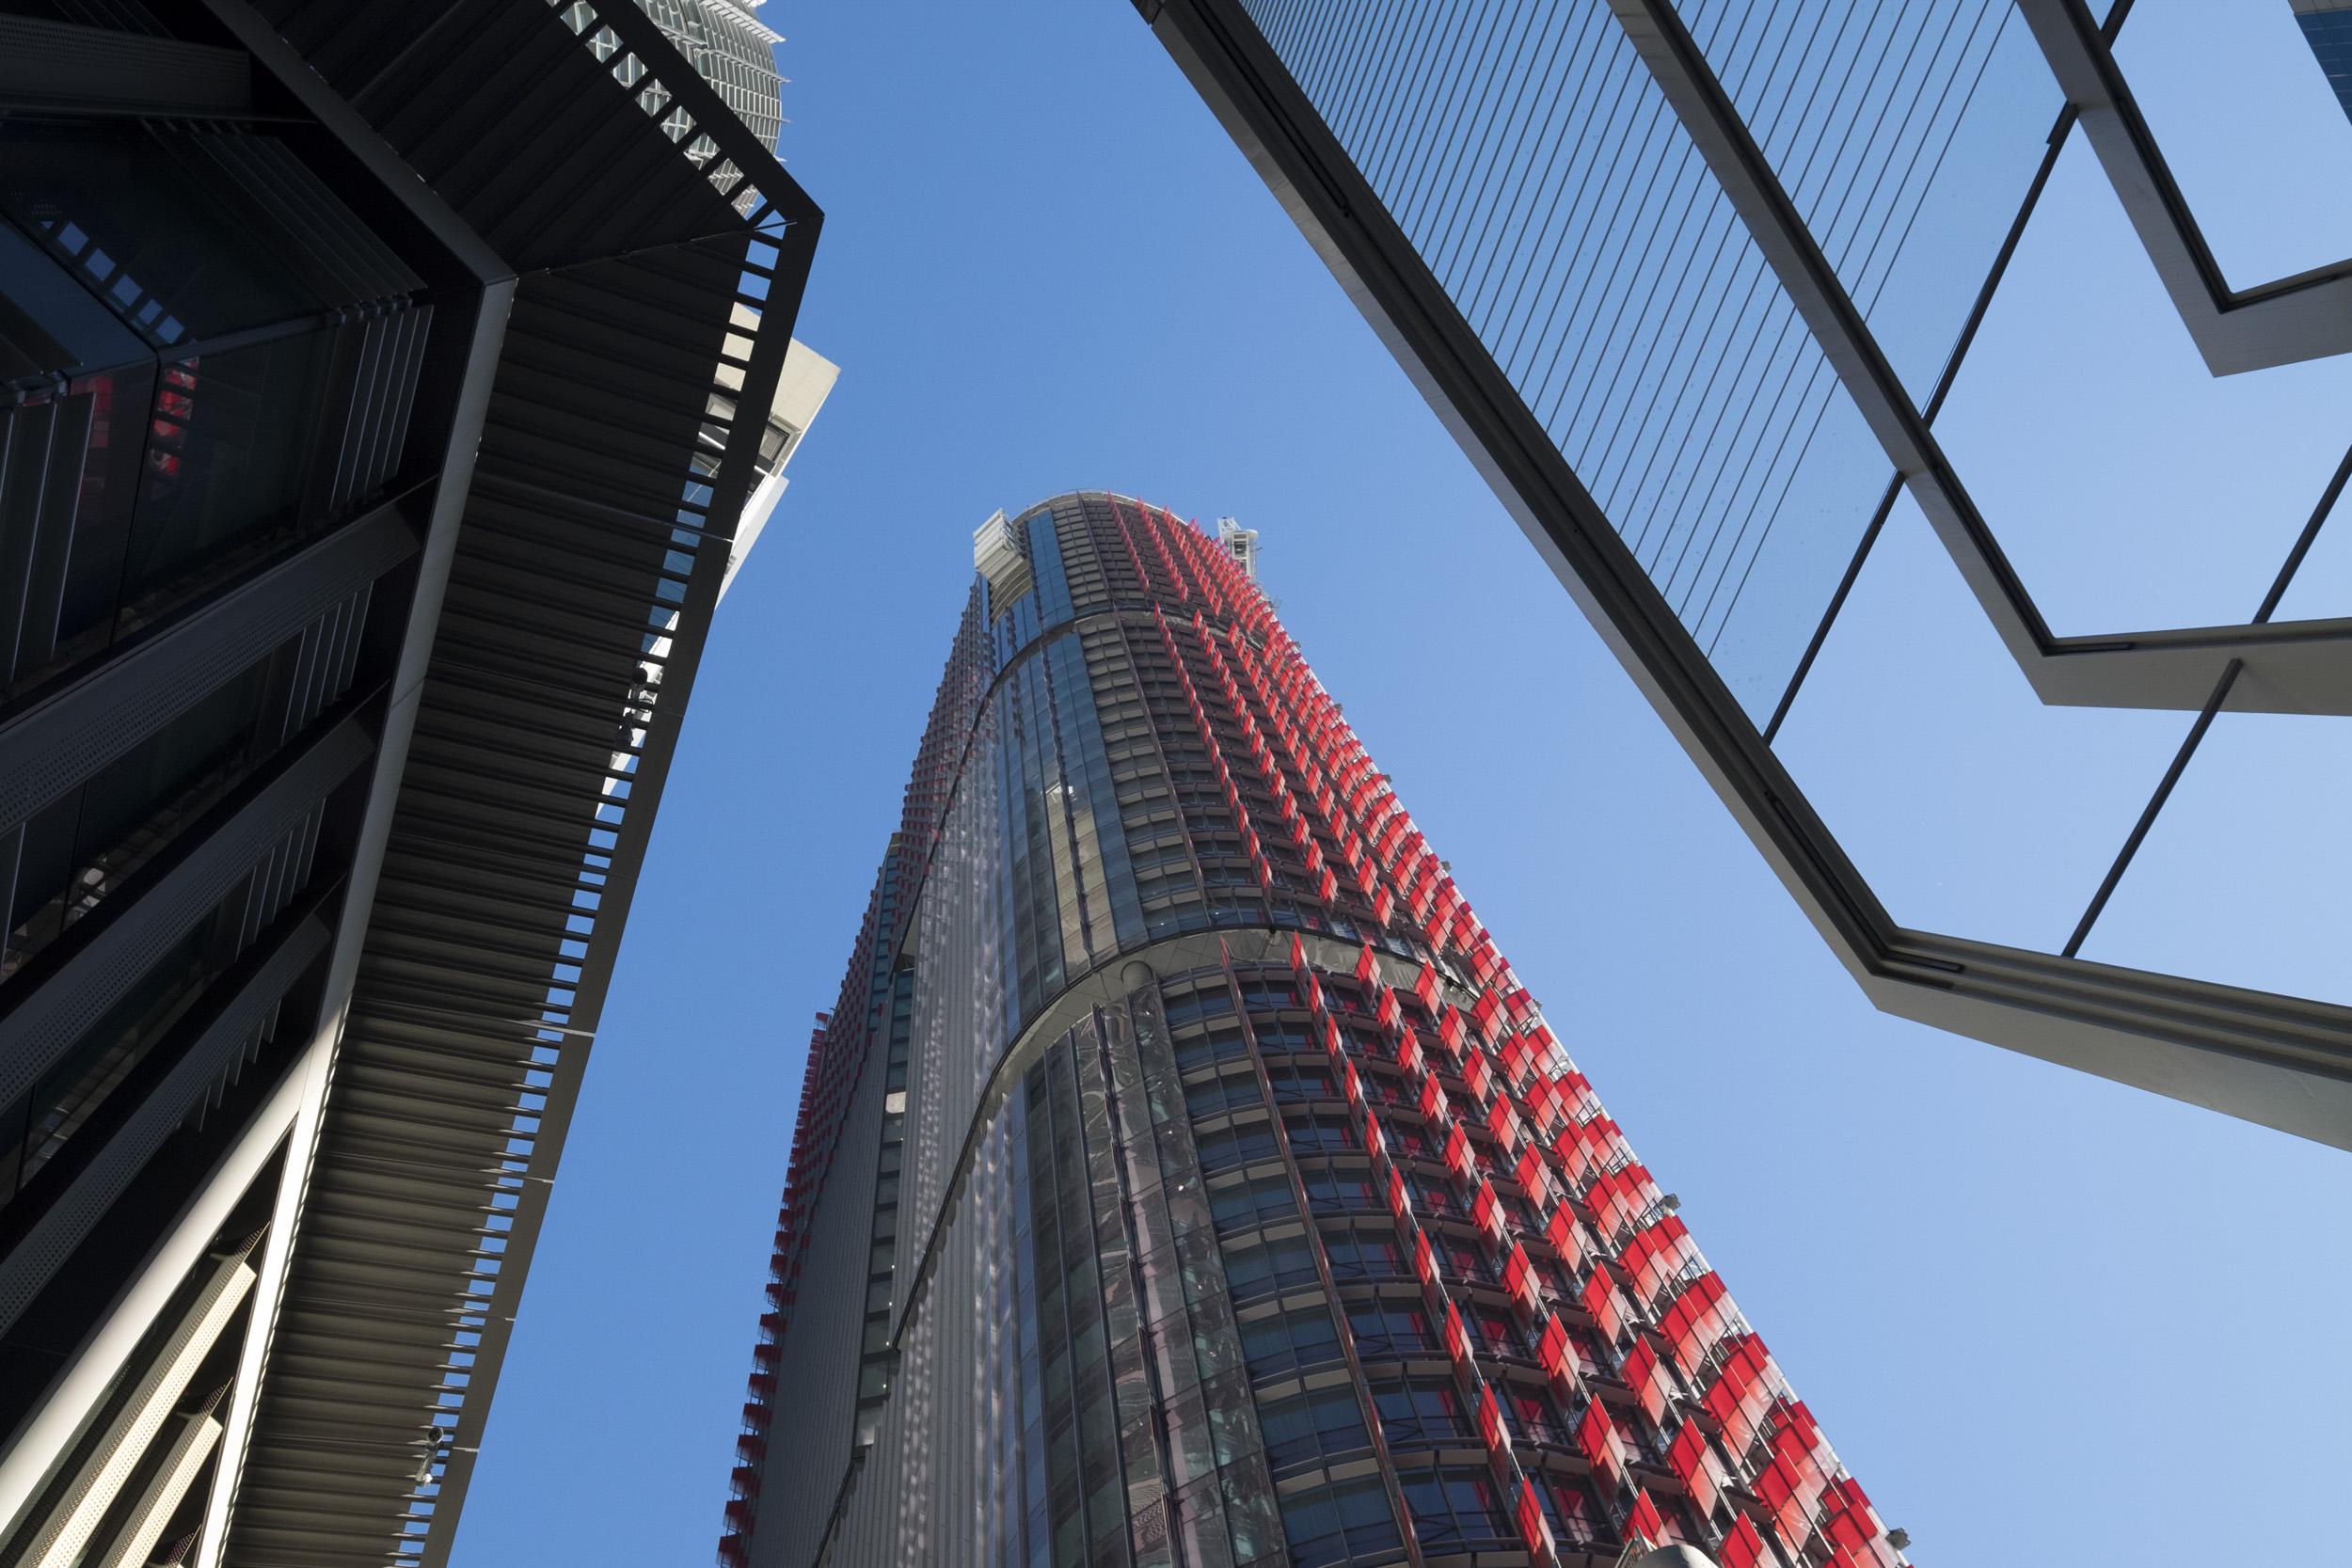 hirise_architecture_sydney_australia_19.jpg